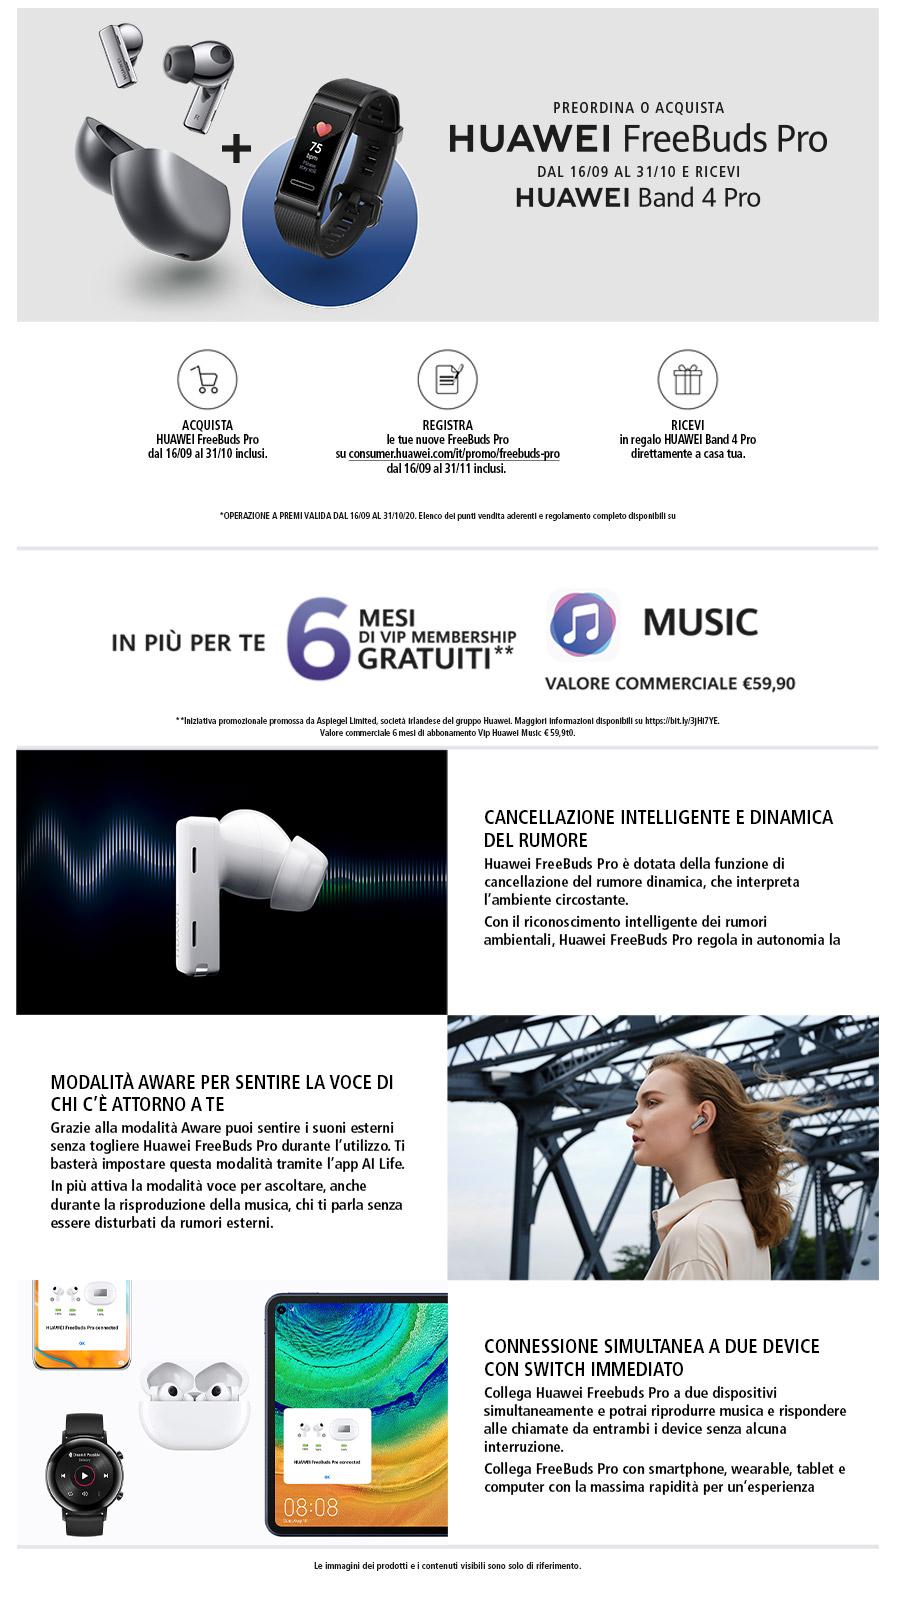 Promozione TV & Audio: Huawei Free Buds Pro Preorder